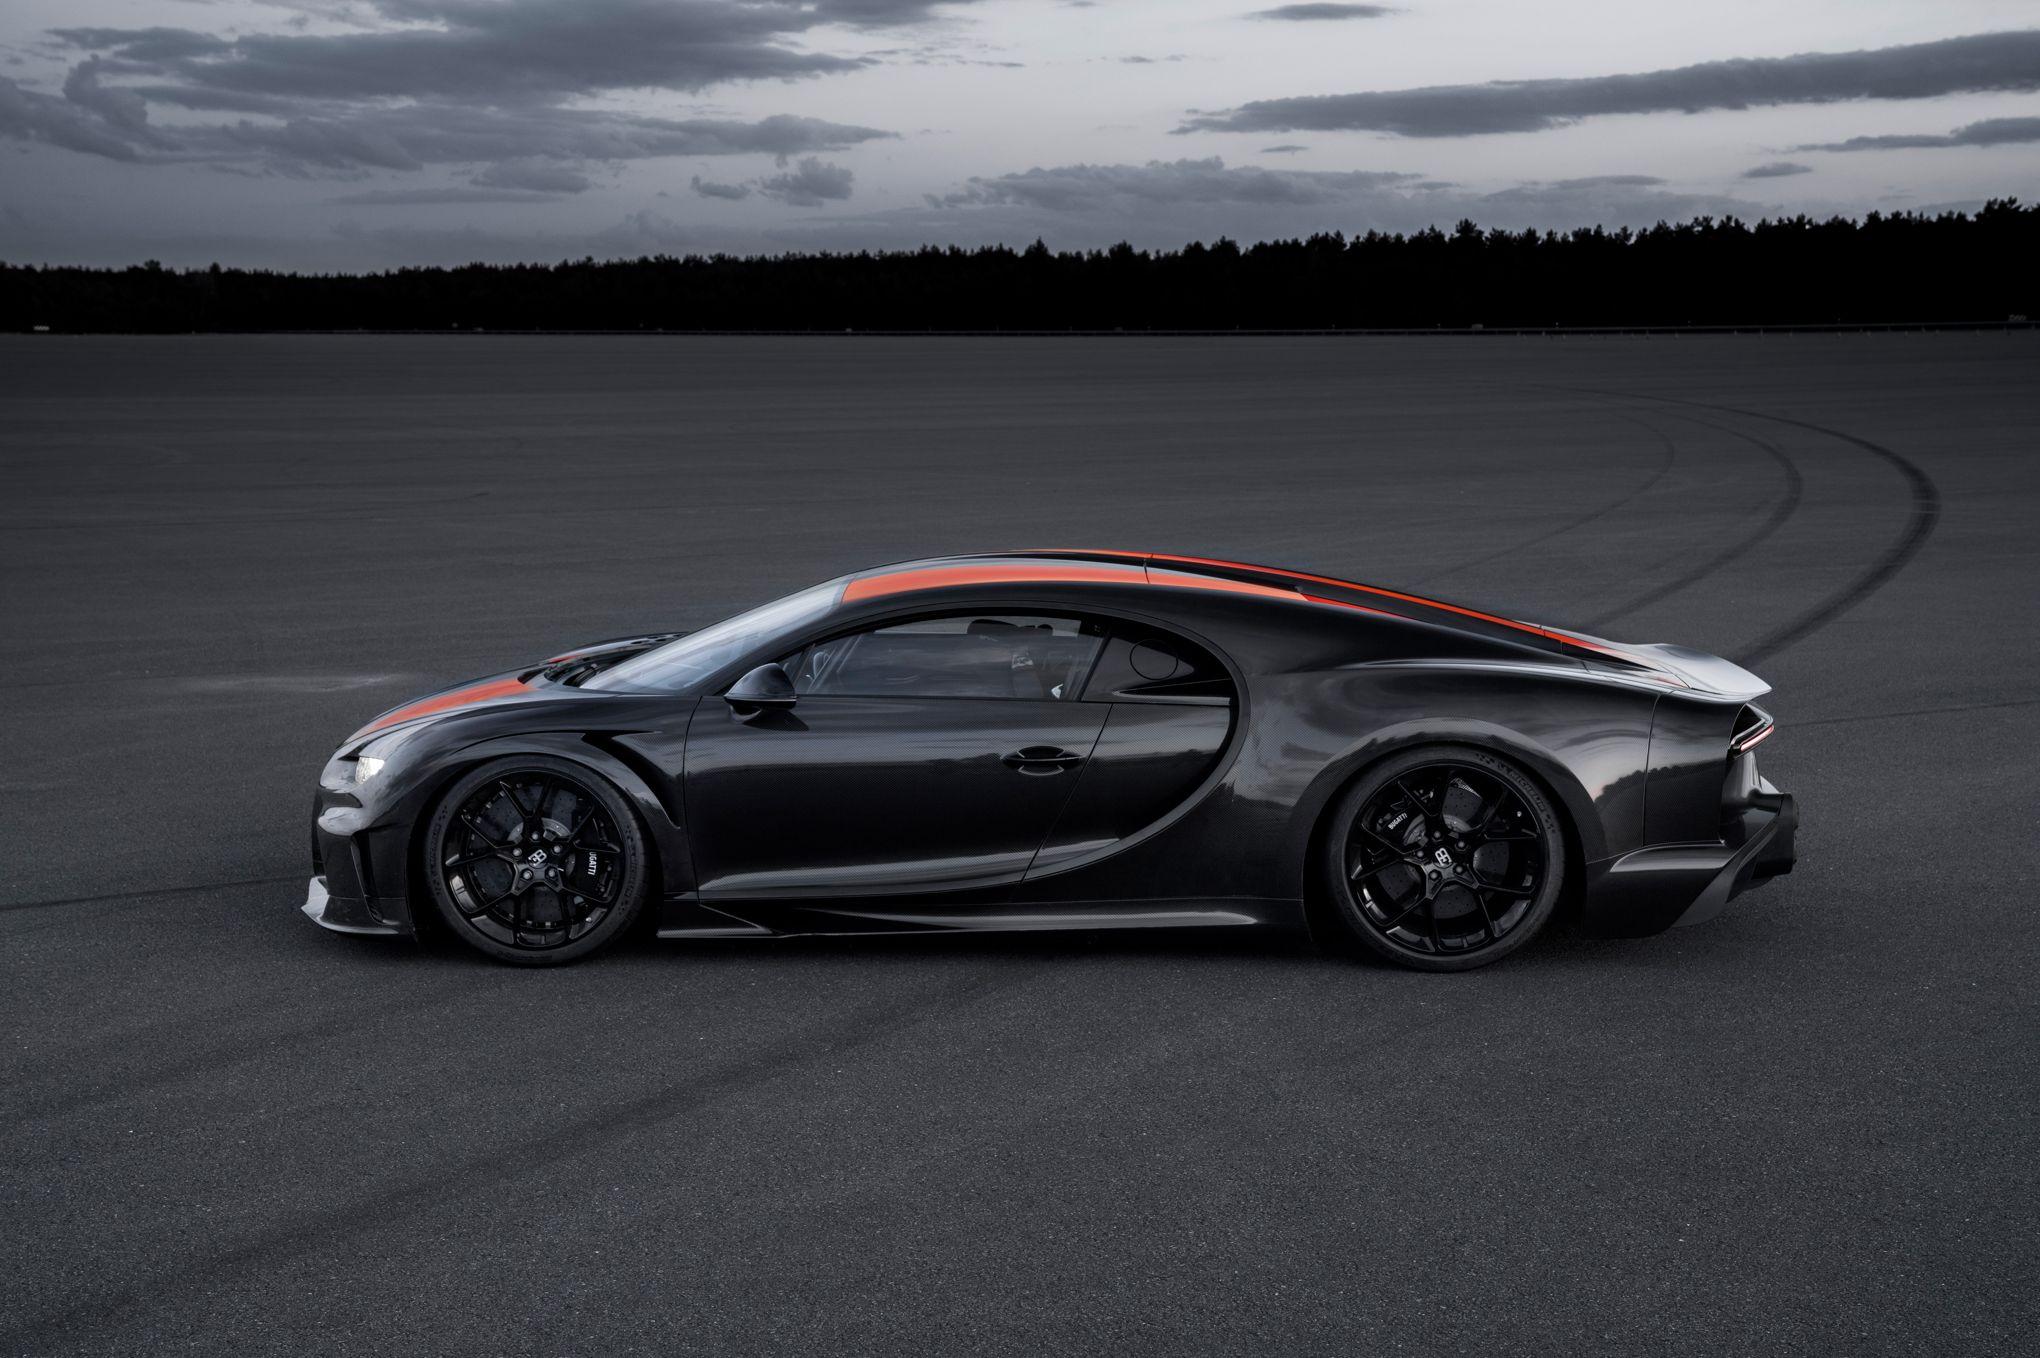 Bugatti Chiron Super Sport 300+, une enfant du record